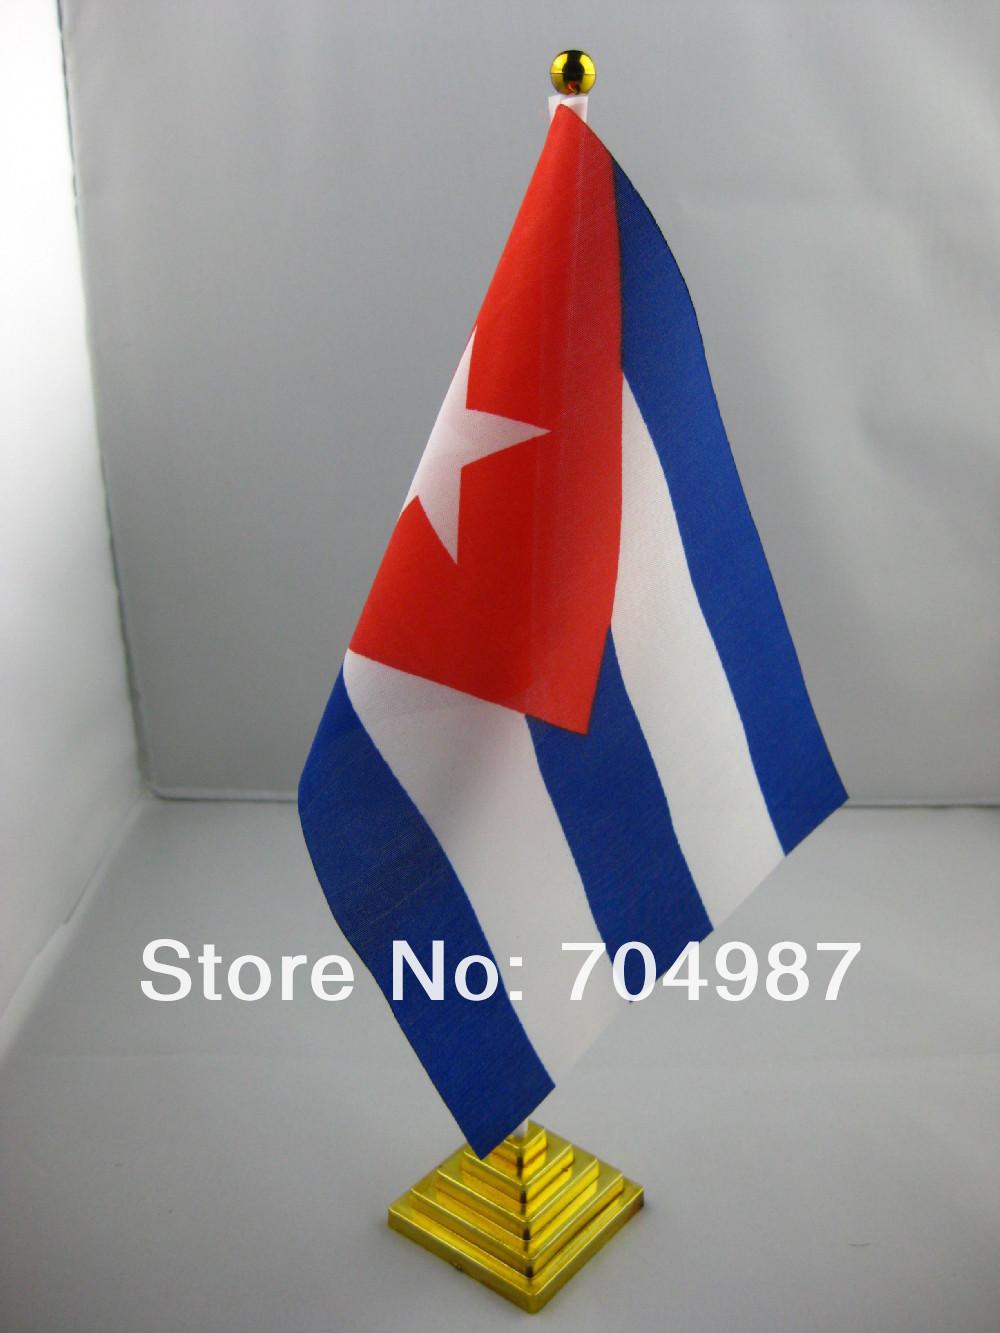 Cuba table flag desk flag table banner desk banner free shipping(China (Mainland))